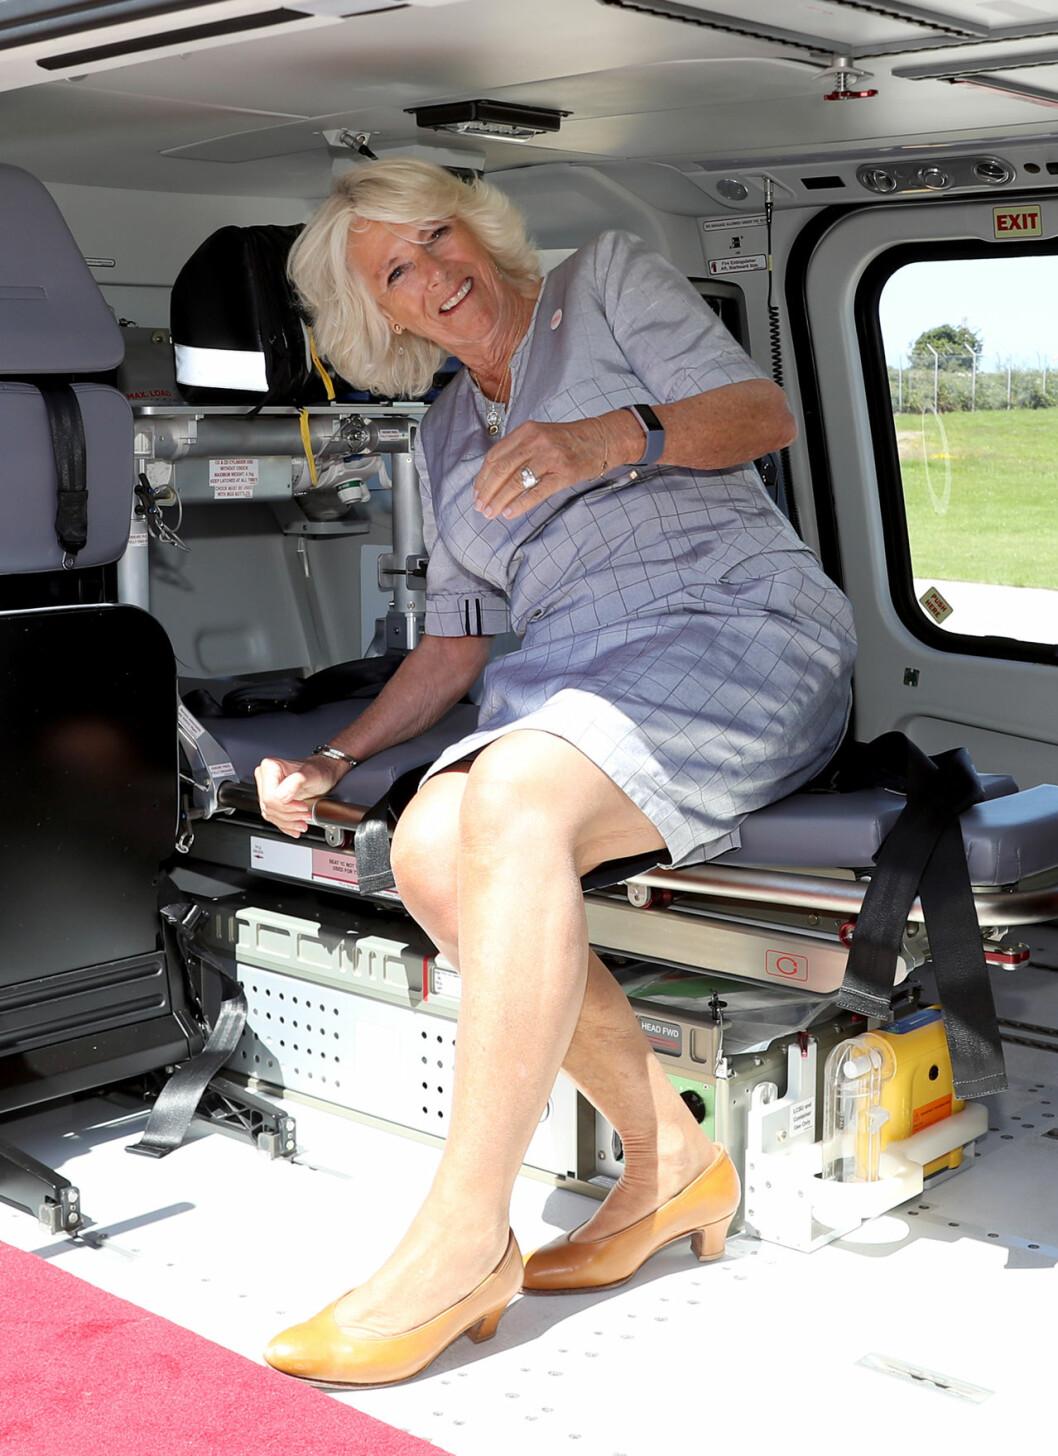 Hertiginnan Camilla i flygambulansen